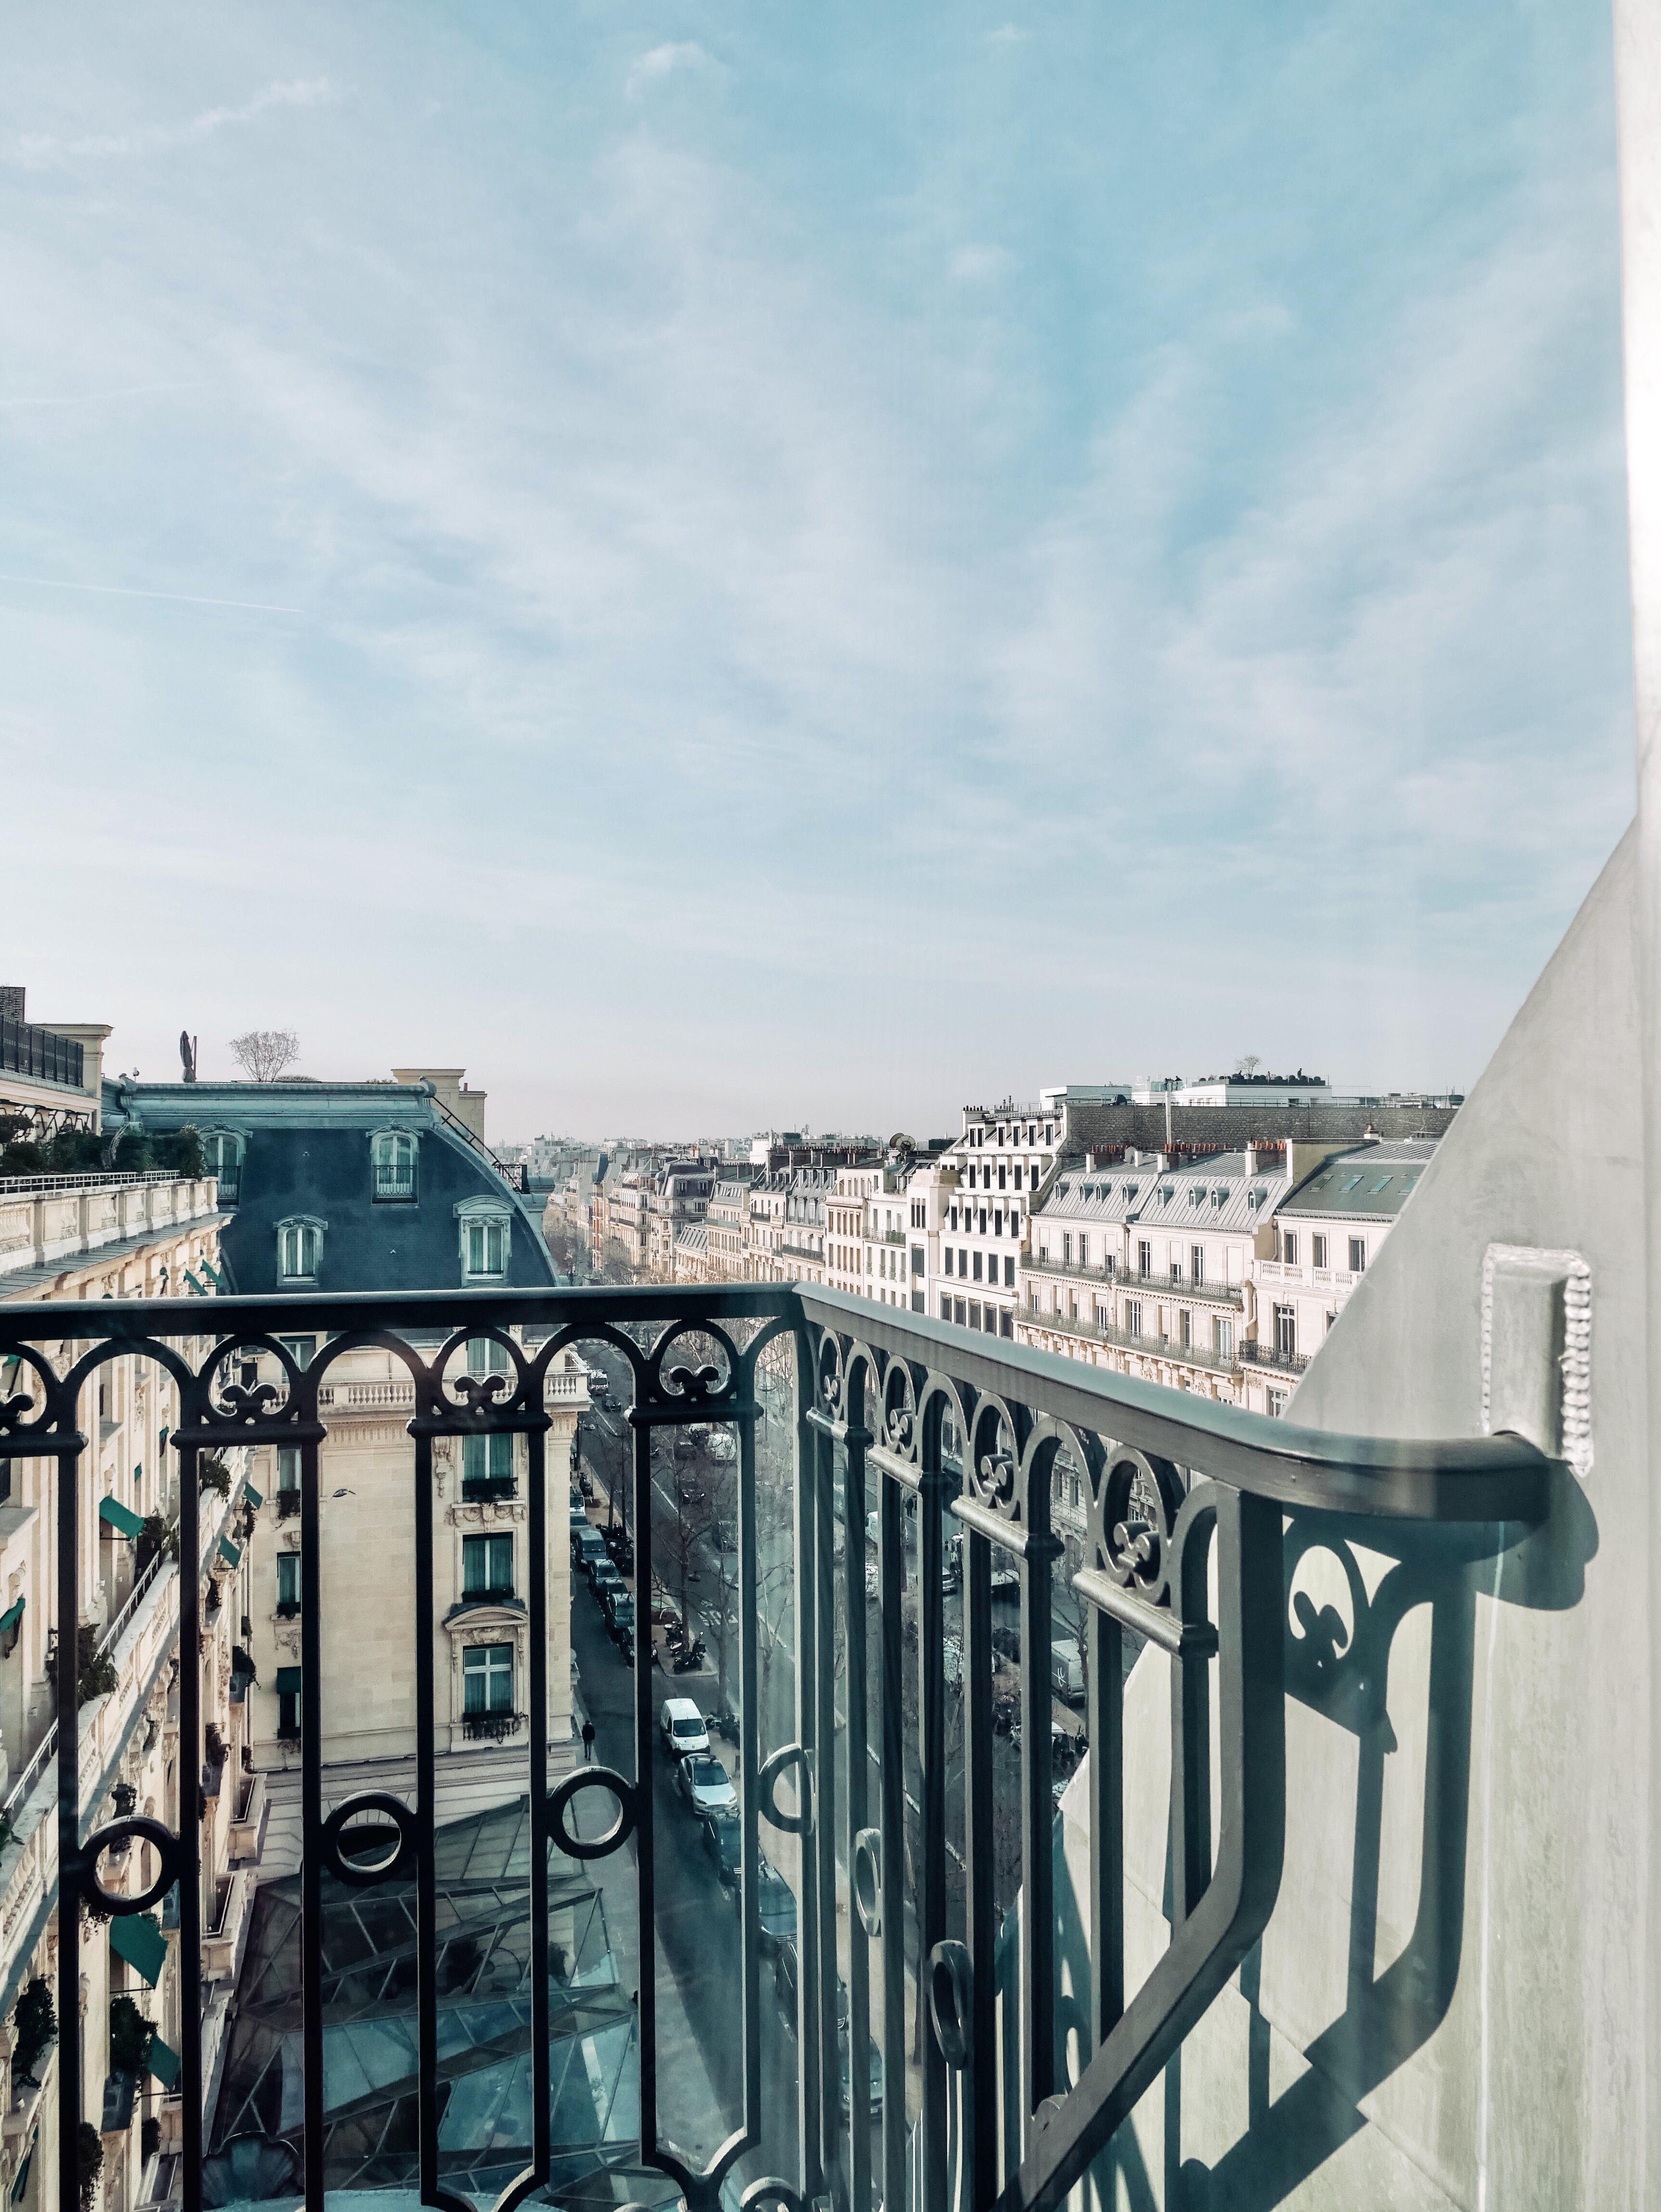 The Peninsula Paris, Best Hotel in Paris, Paris travel, Paris vacations, viaggiare a Paris, holiday in Paris, Impastastorie, Impastastorie Bistro, Hotels Paris,